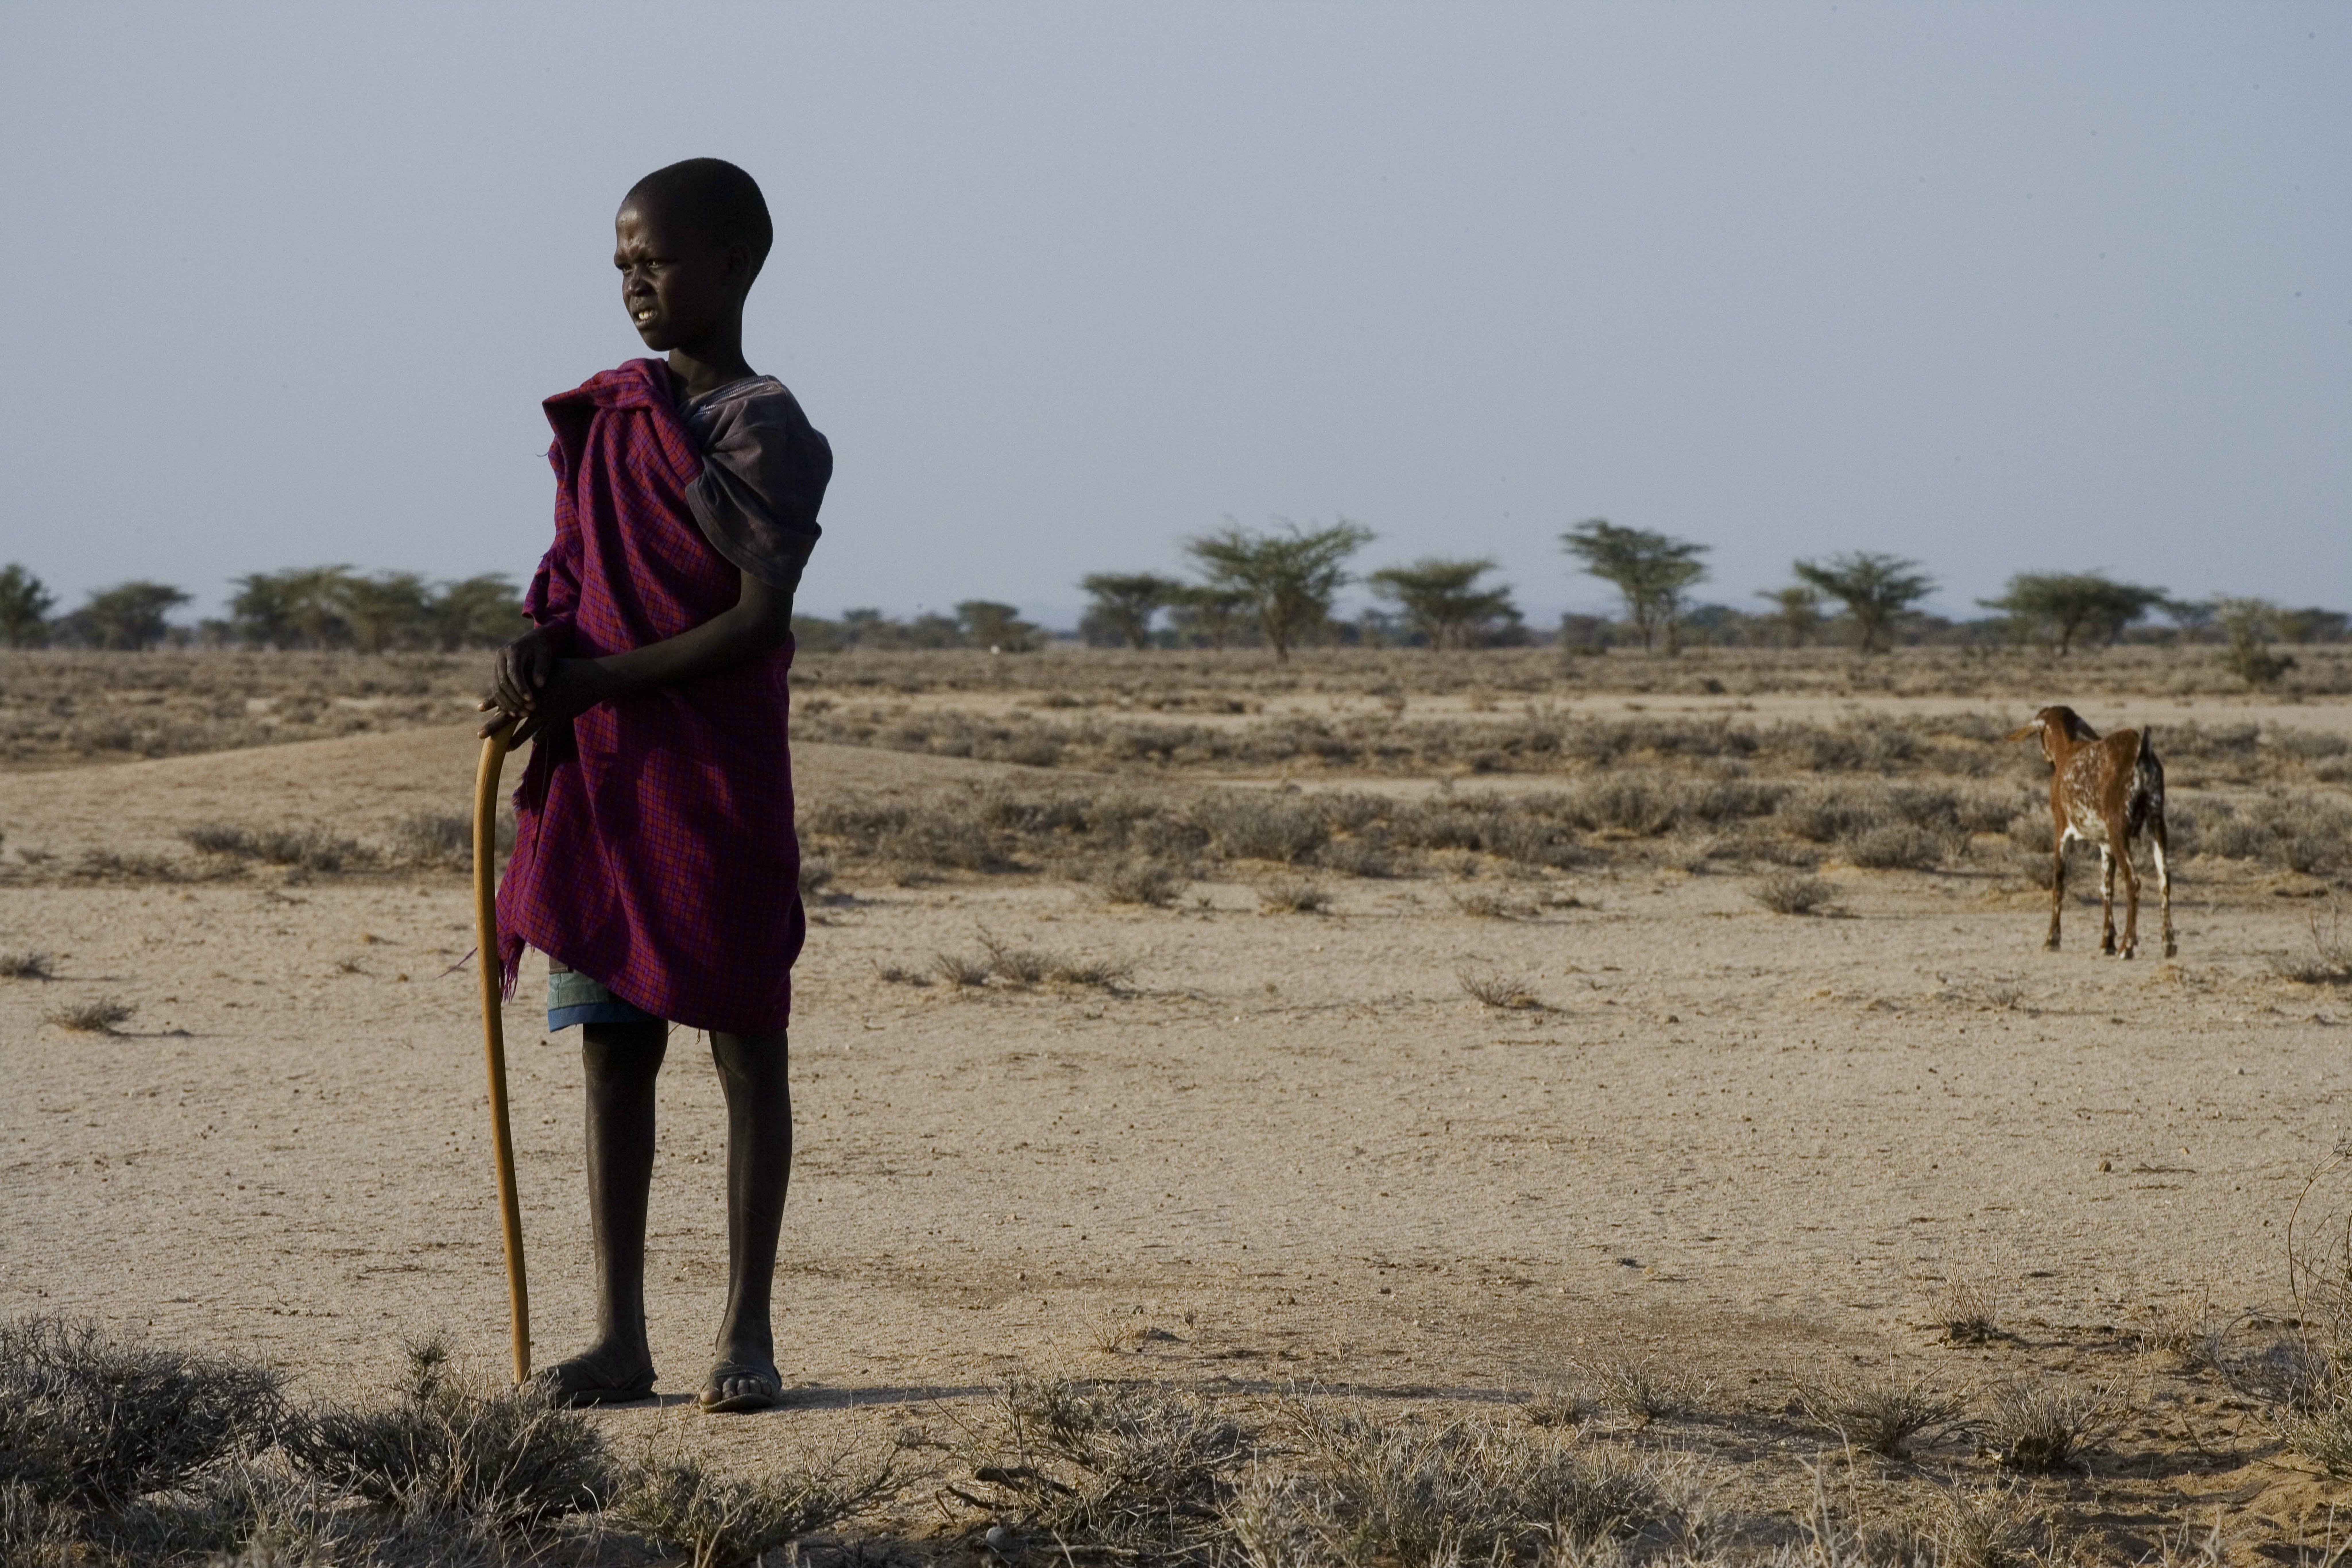 © UNICEF/NYHQ2011-1035/Holt